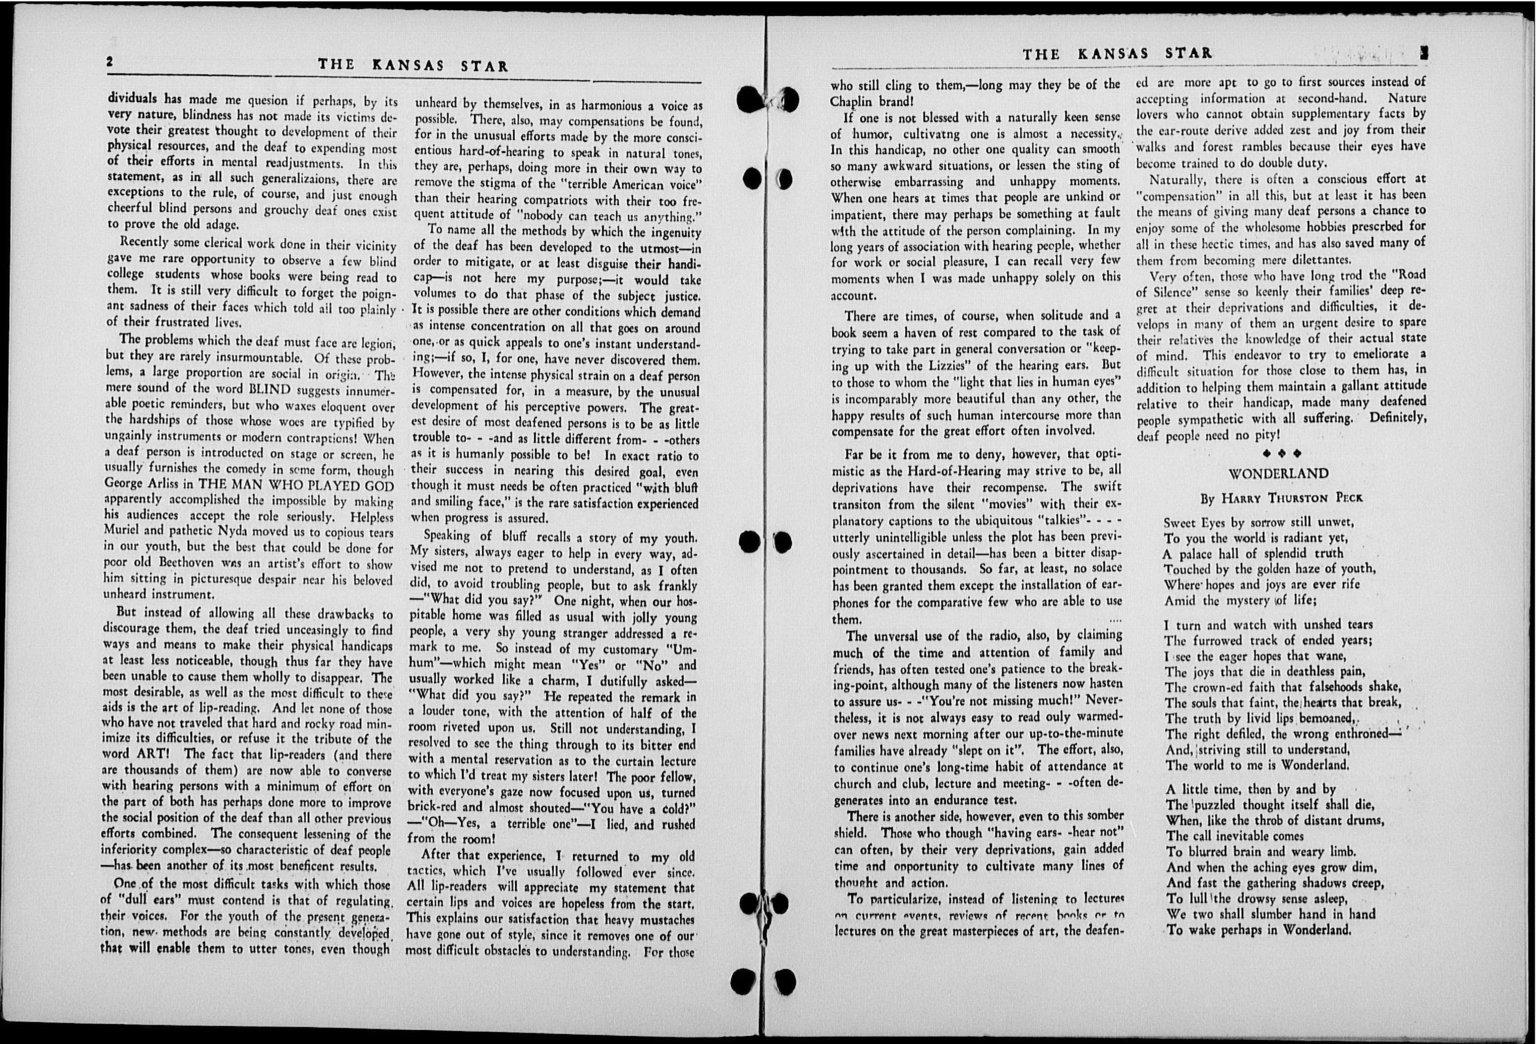 The Kansas Star, volume 51, number 7 - 2-3